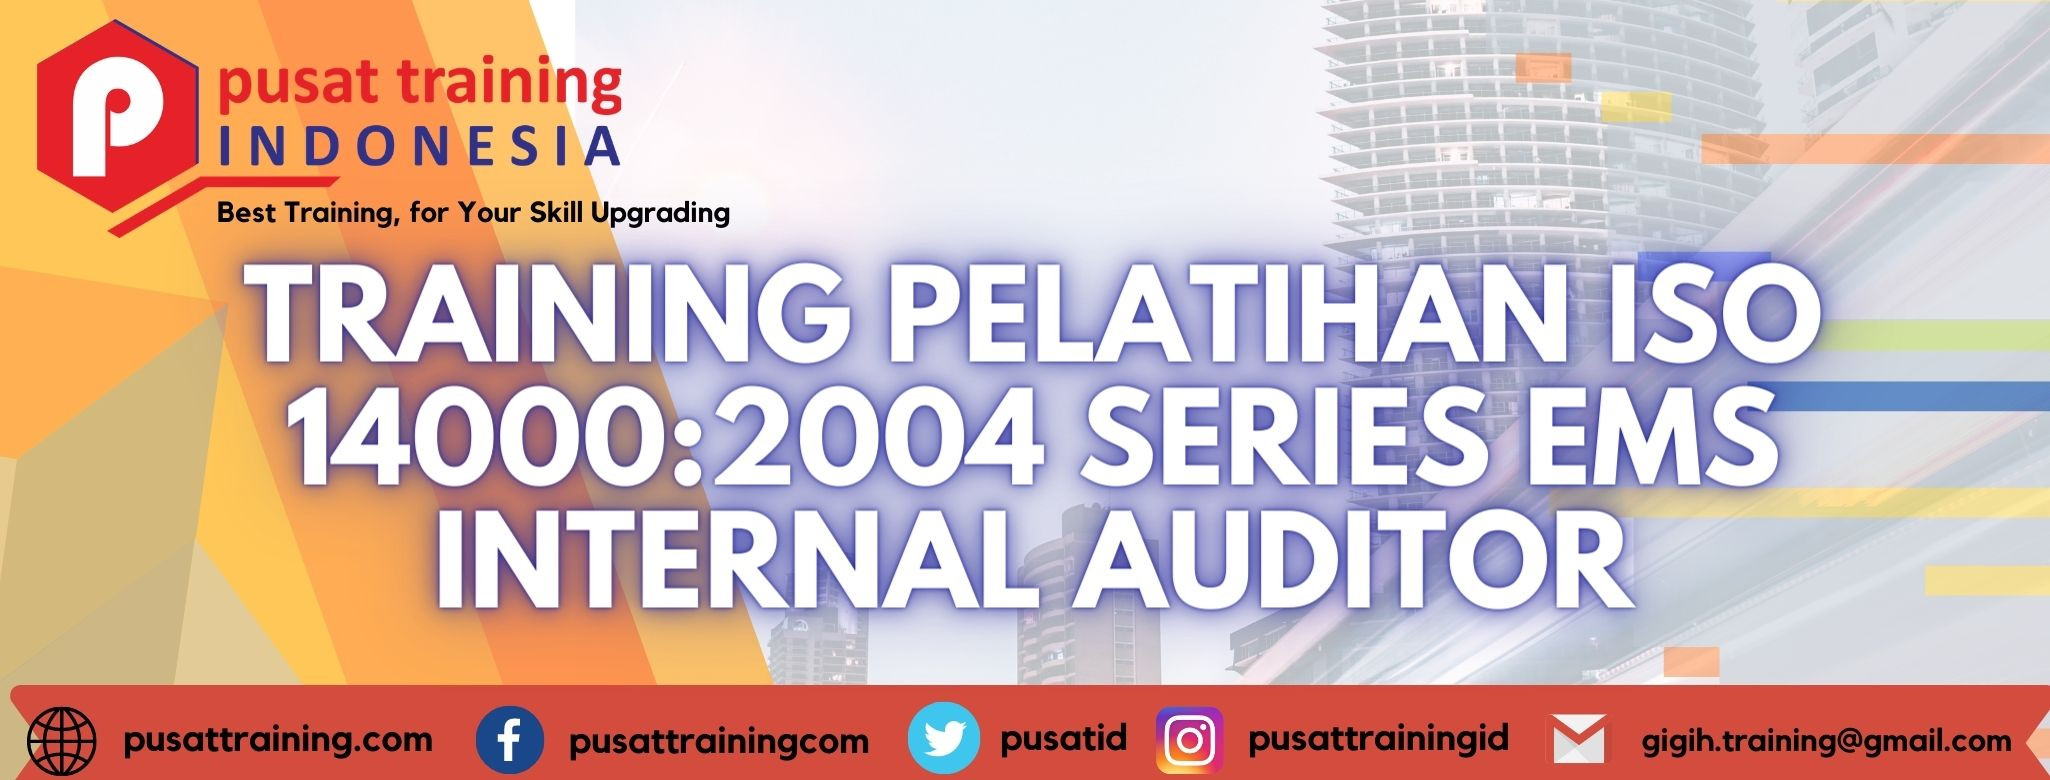 TRAINING PELATIHAN ISO 140002004 SERIES EMS INTERNAL AUDITOR